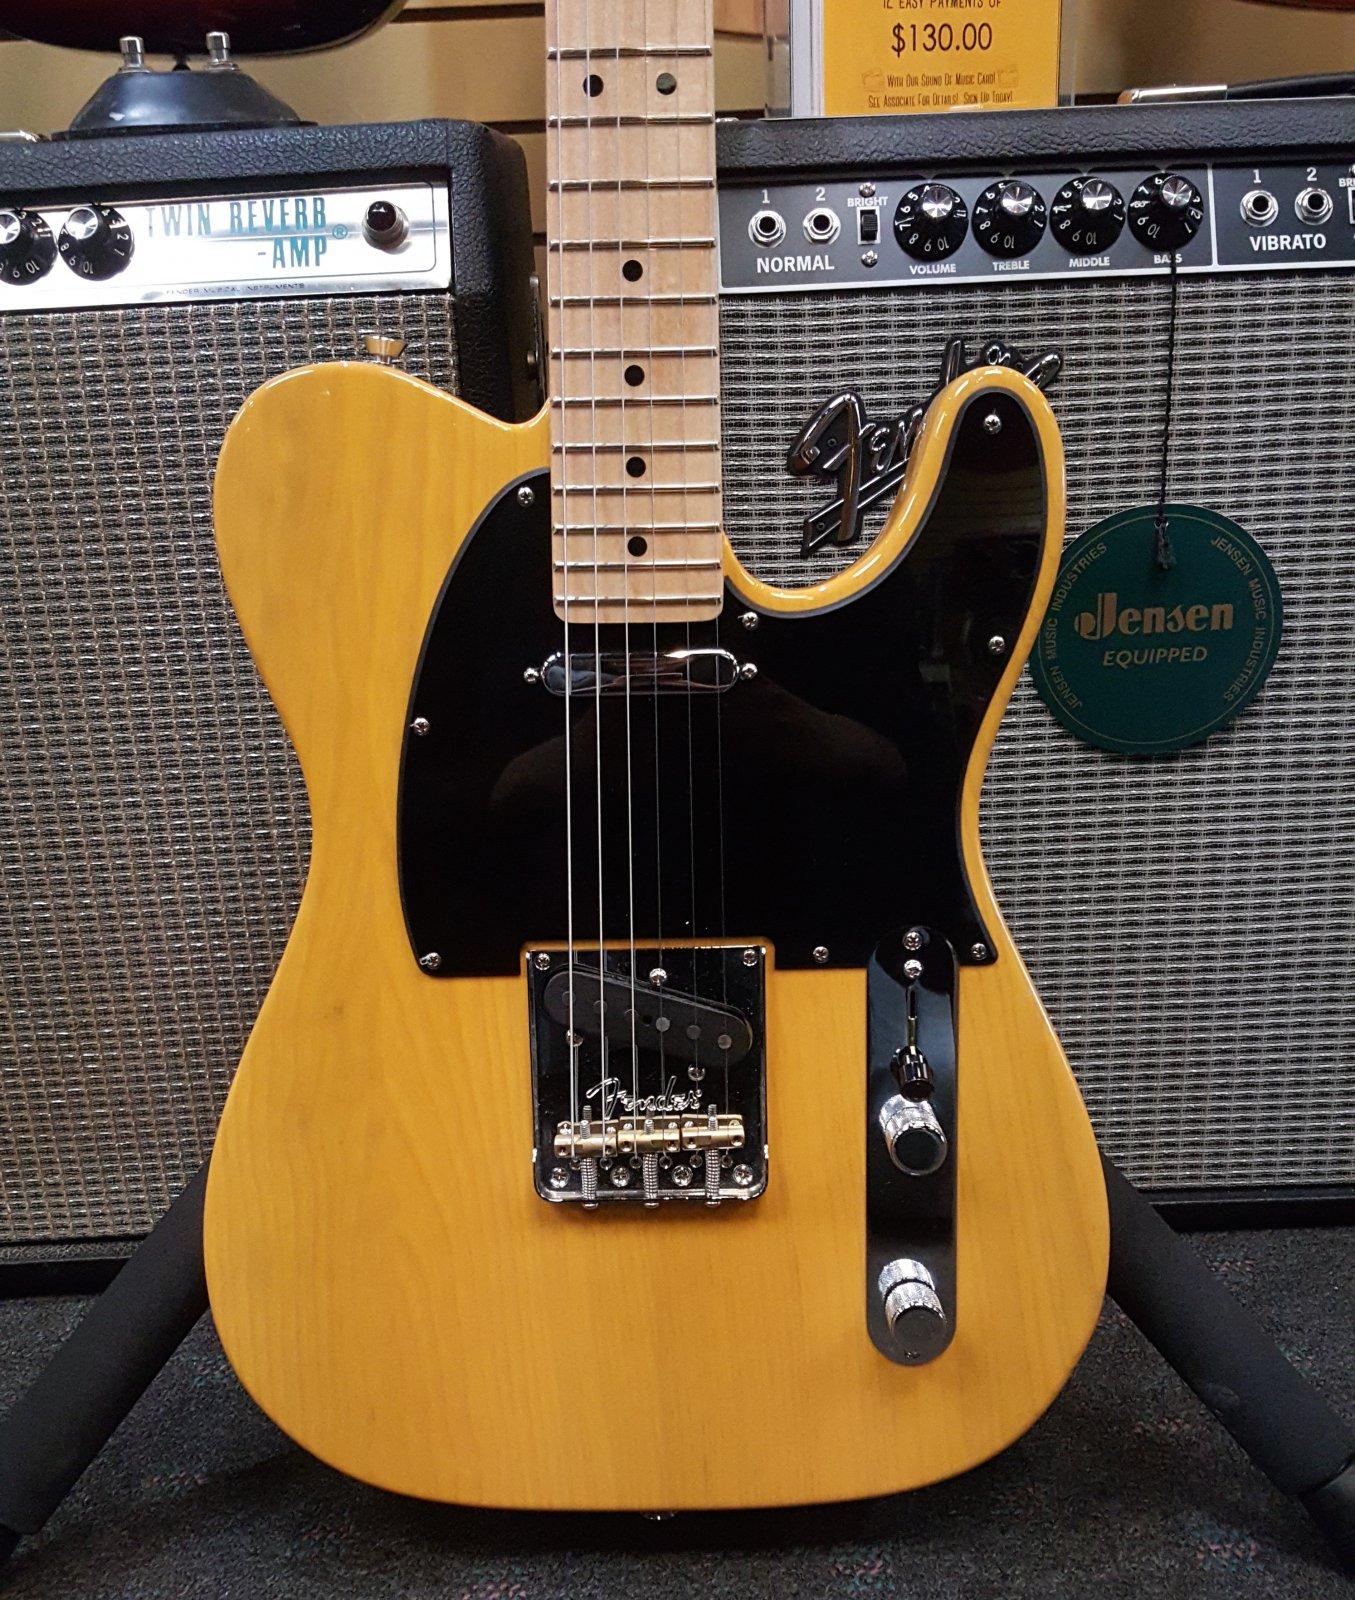 DEMO Fender American Pro Telecaster, Maple Fingerboard, Butterscotch Blonde